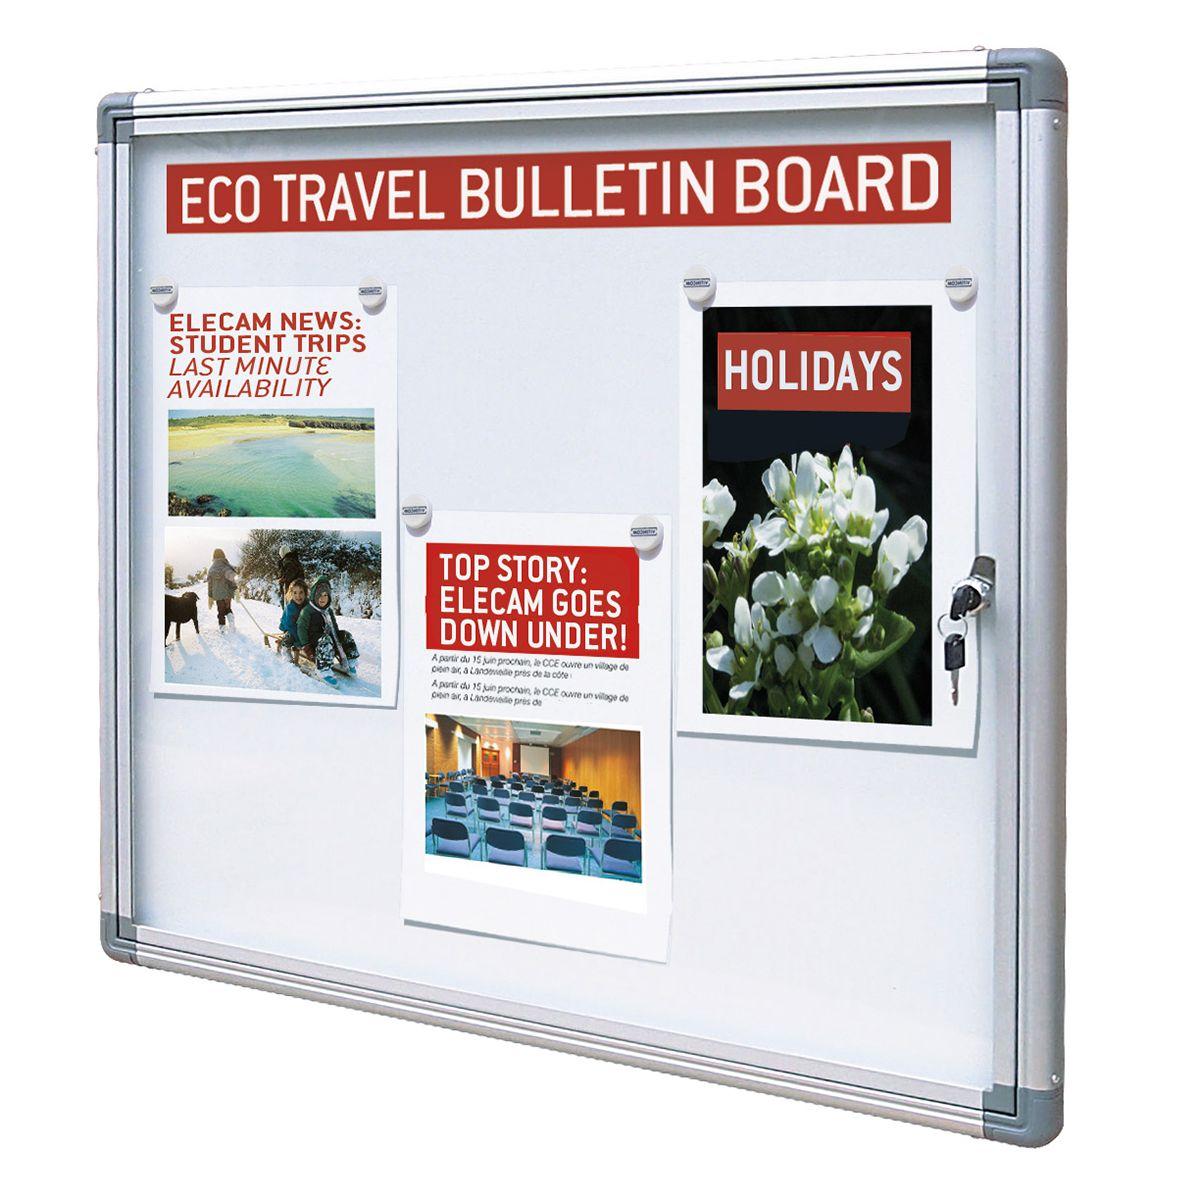 Budget display boards indoor notice board from bigdug uk for Office display board